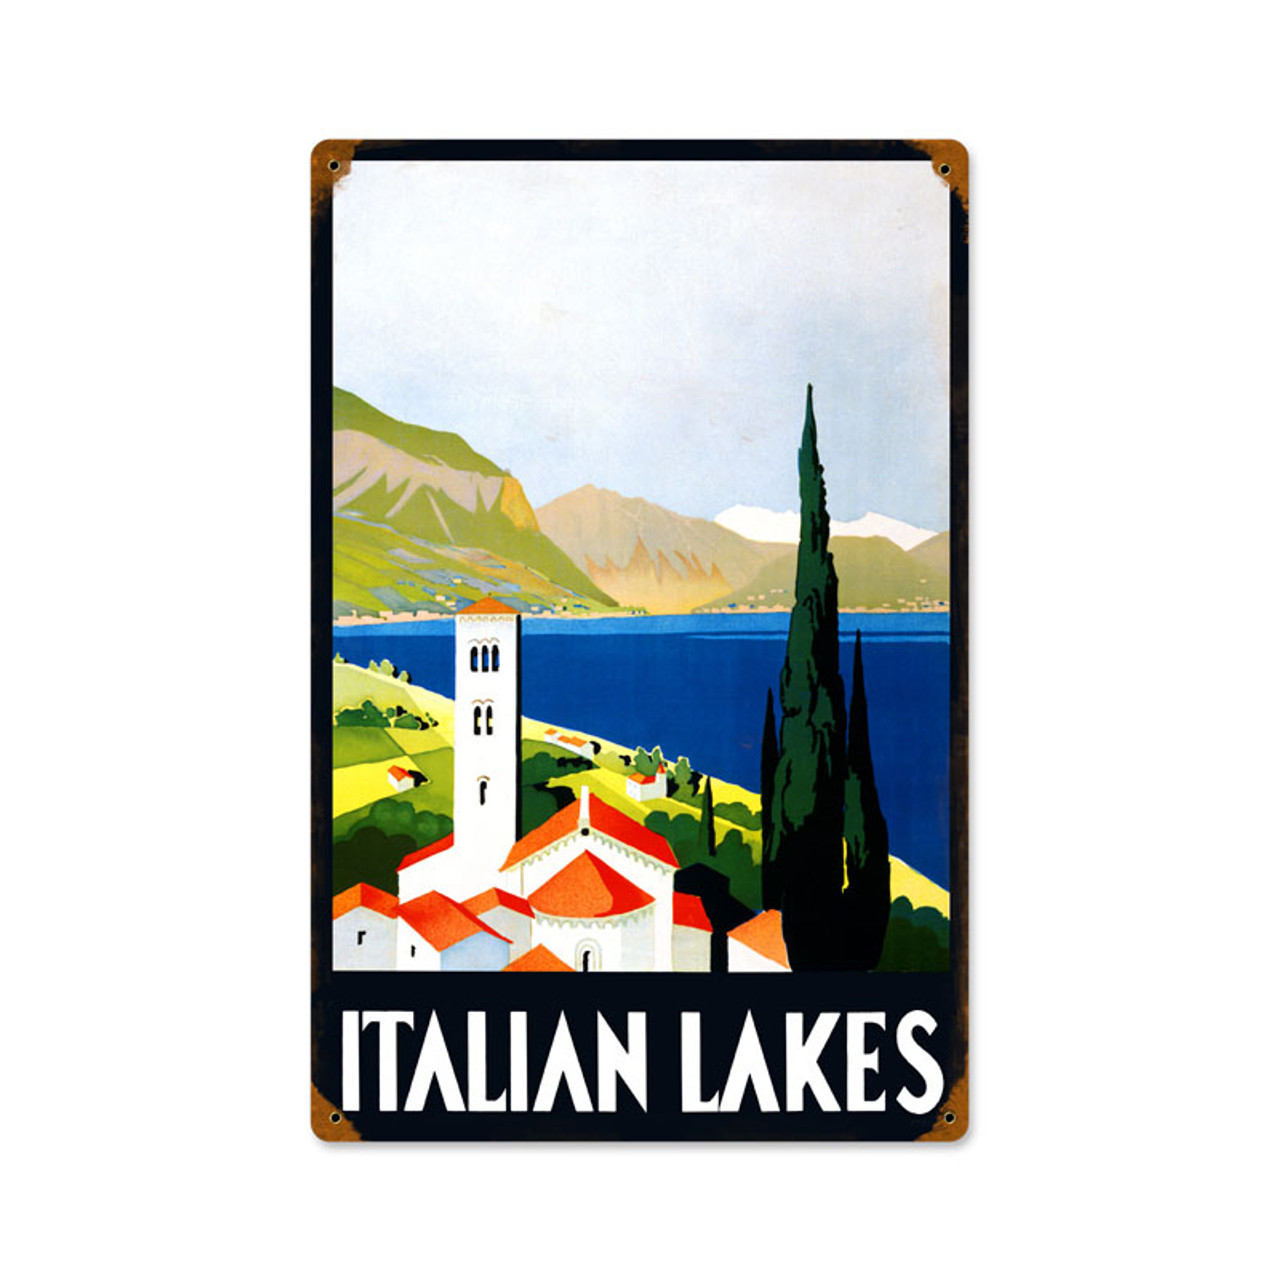 Retro Italian Lakes  Metal Sign   12 x 18 Inches